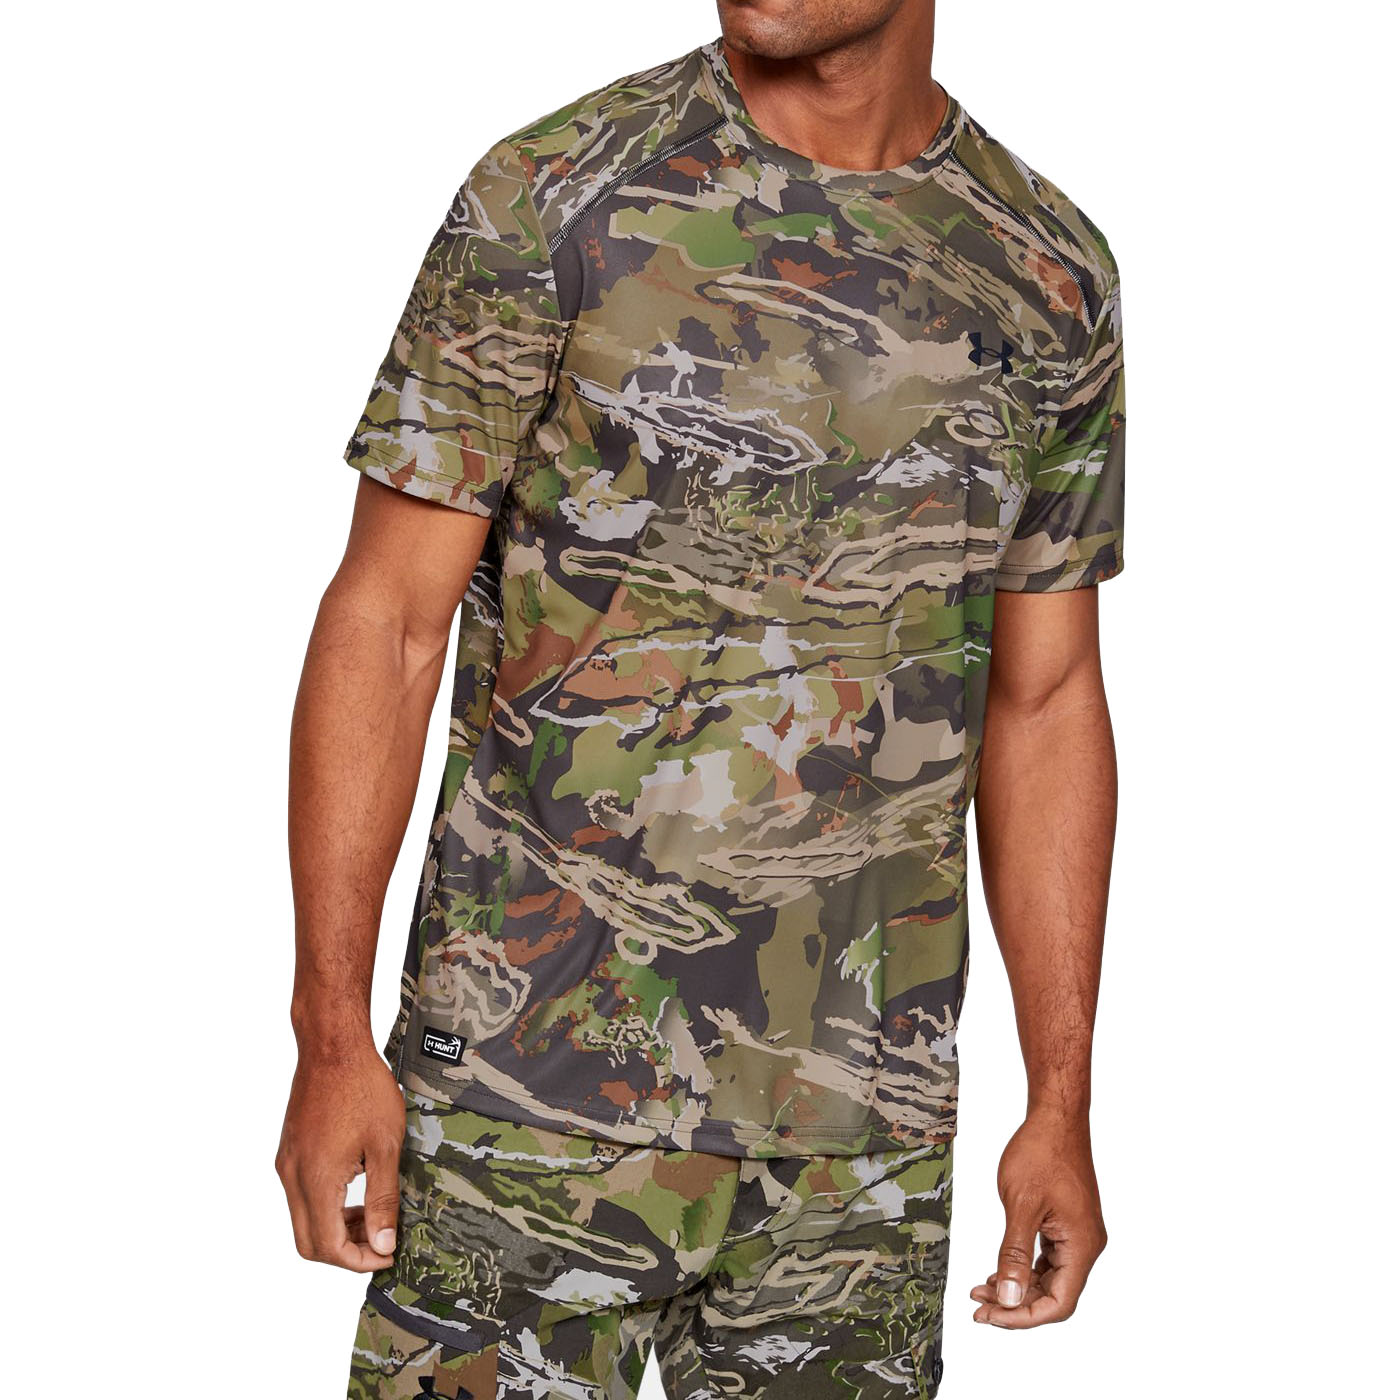 Under Armour Men's Iso-Chill Brush Line Short-Sleeve Tee